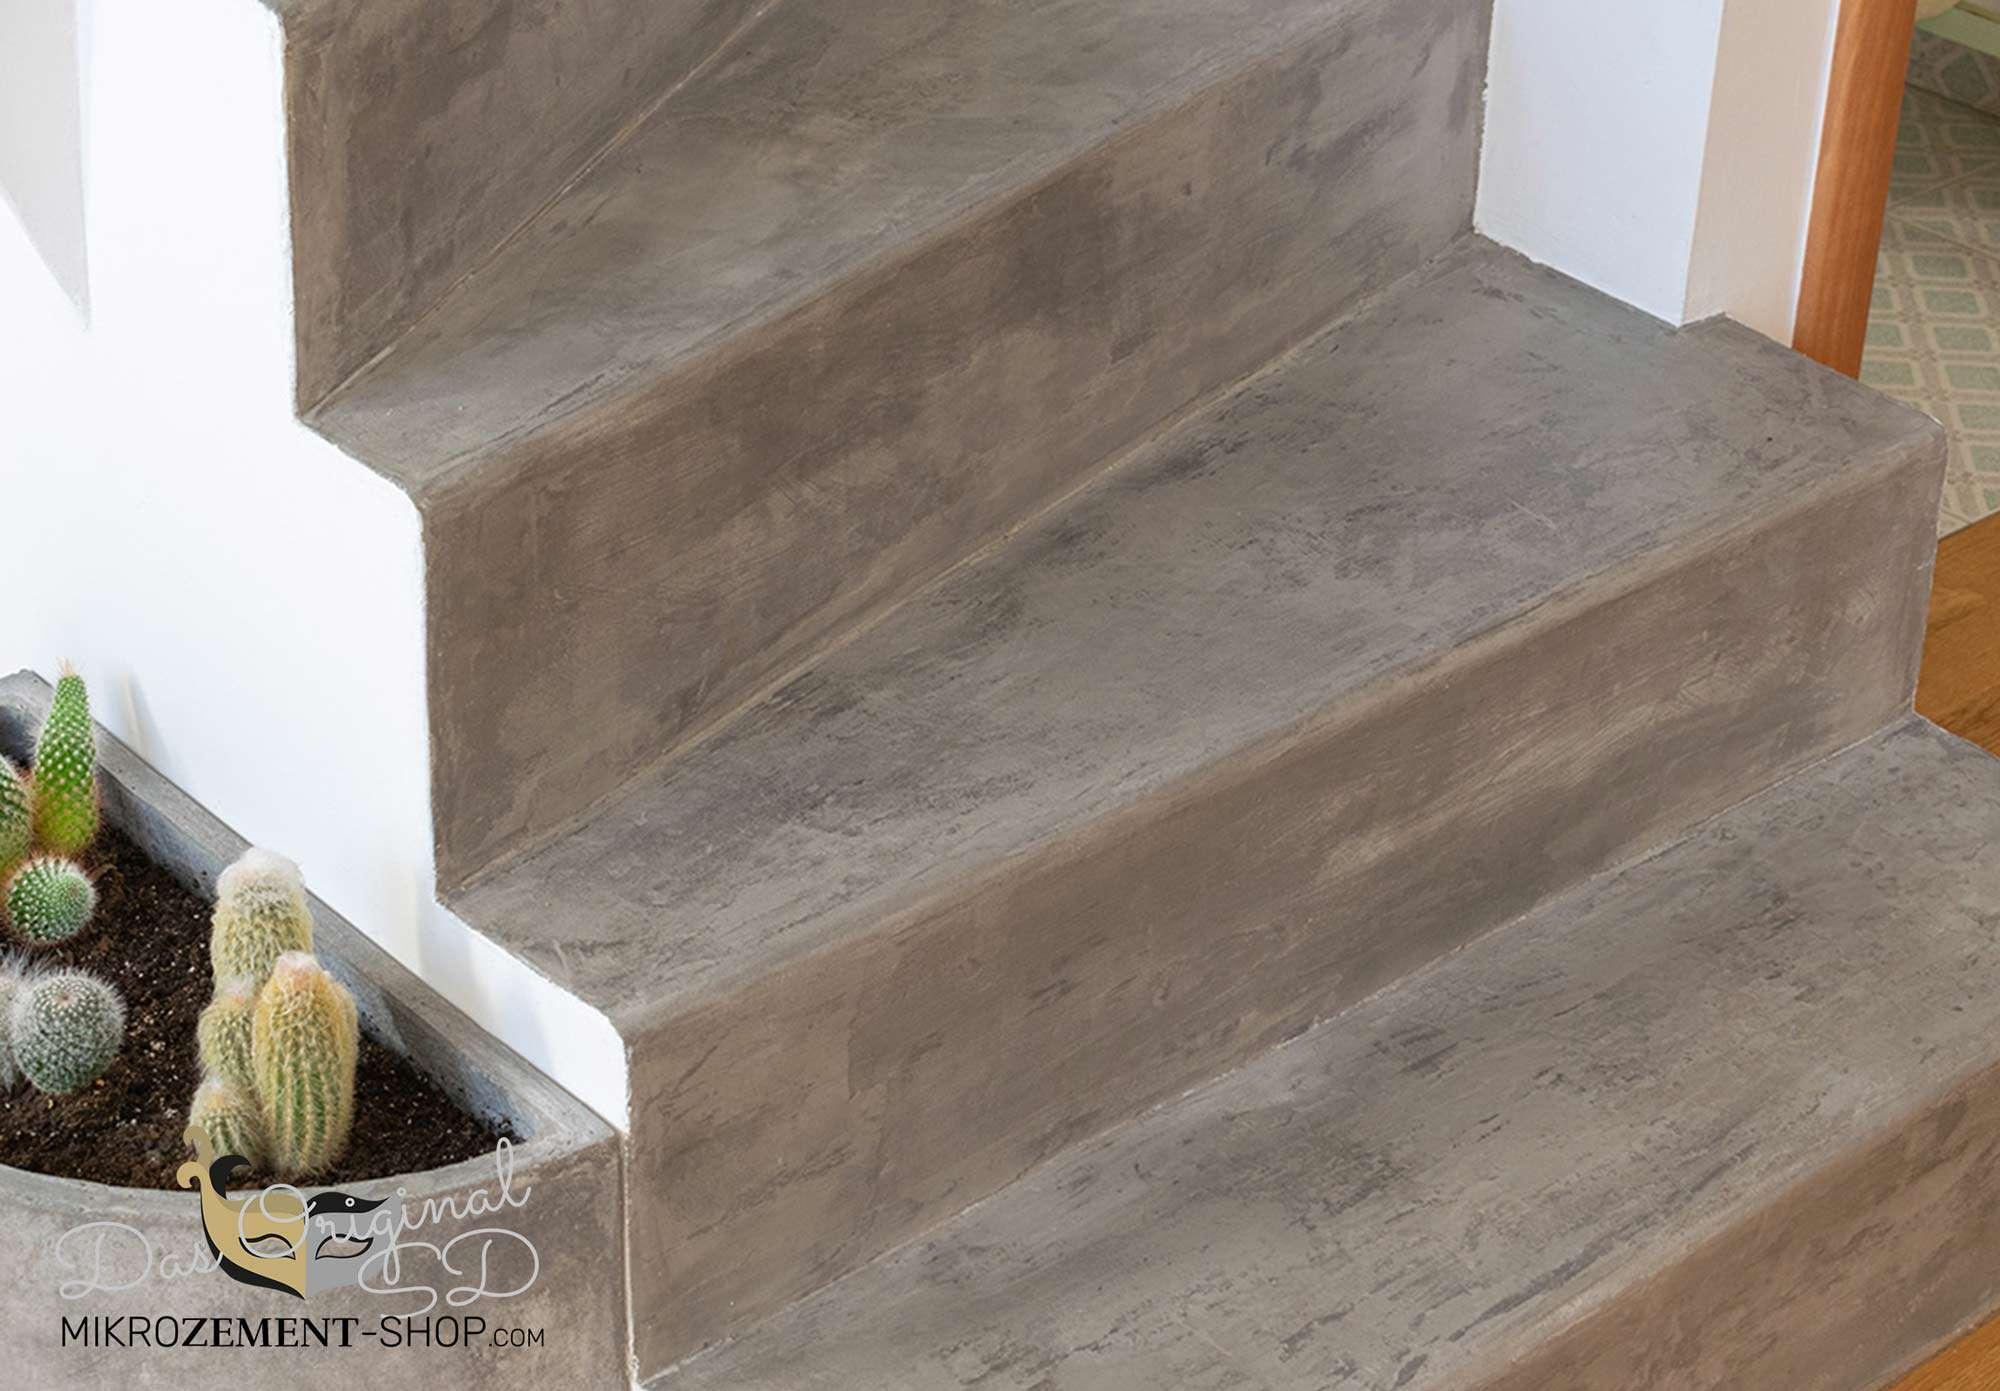 Mikrozement in Treppenhäuser ist extrem stabil